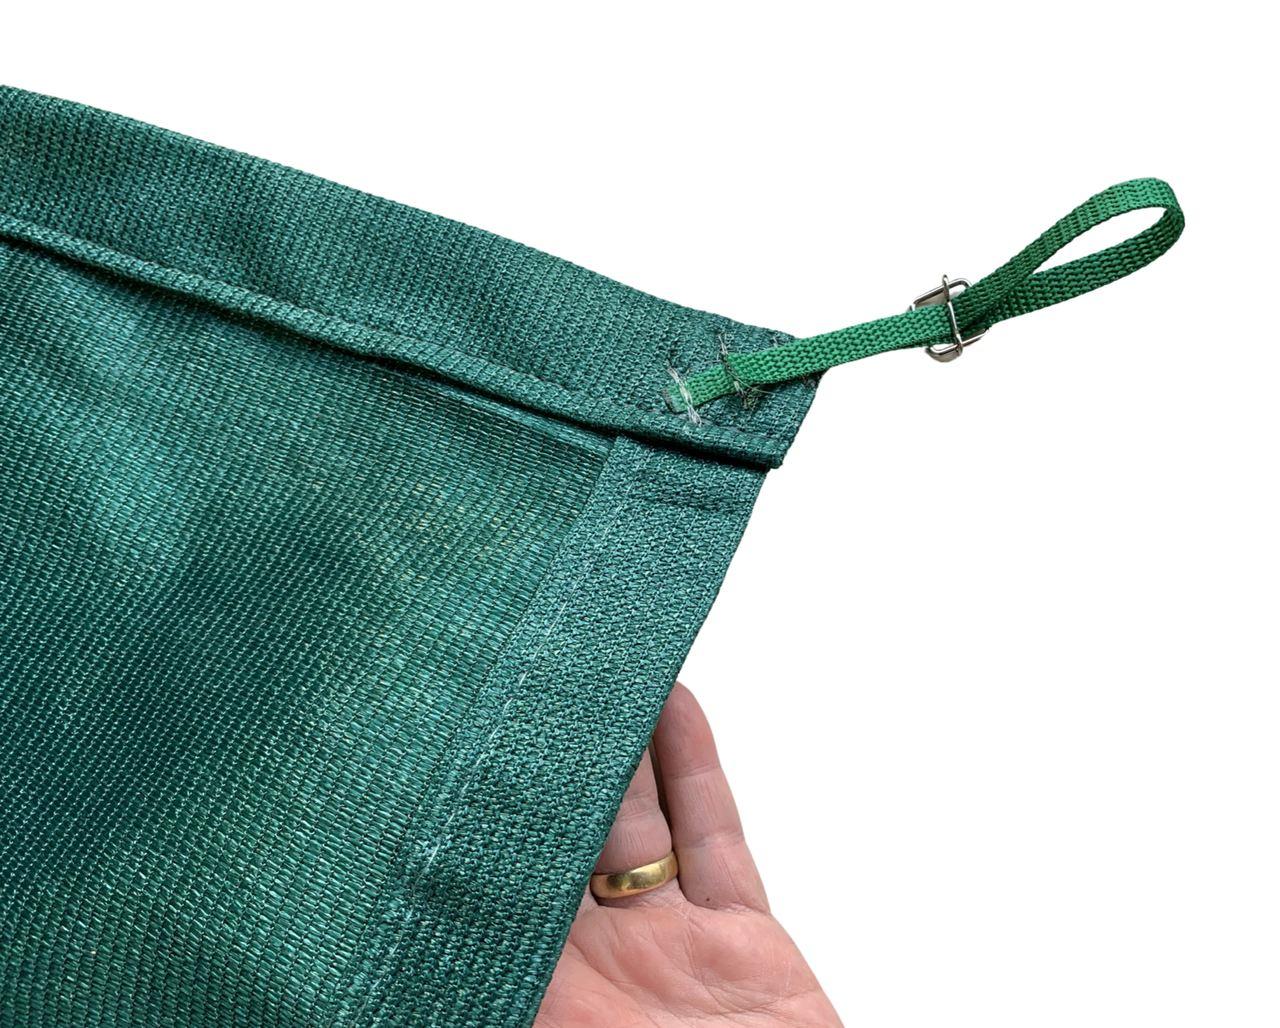 Tela de Sombreamento 90% Verde com Esticadores - Largura: 5 Metros